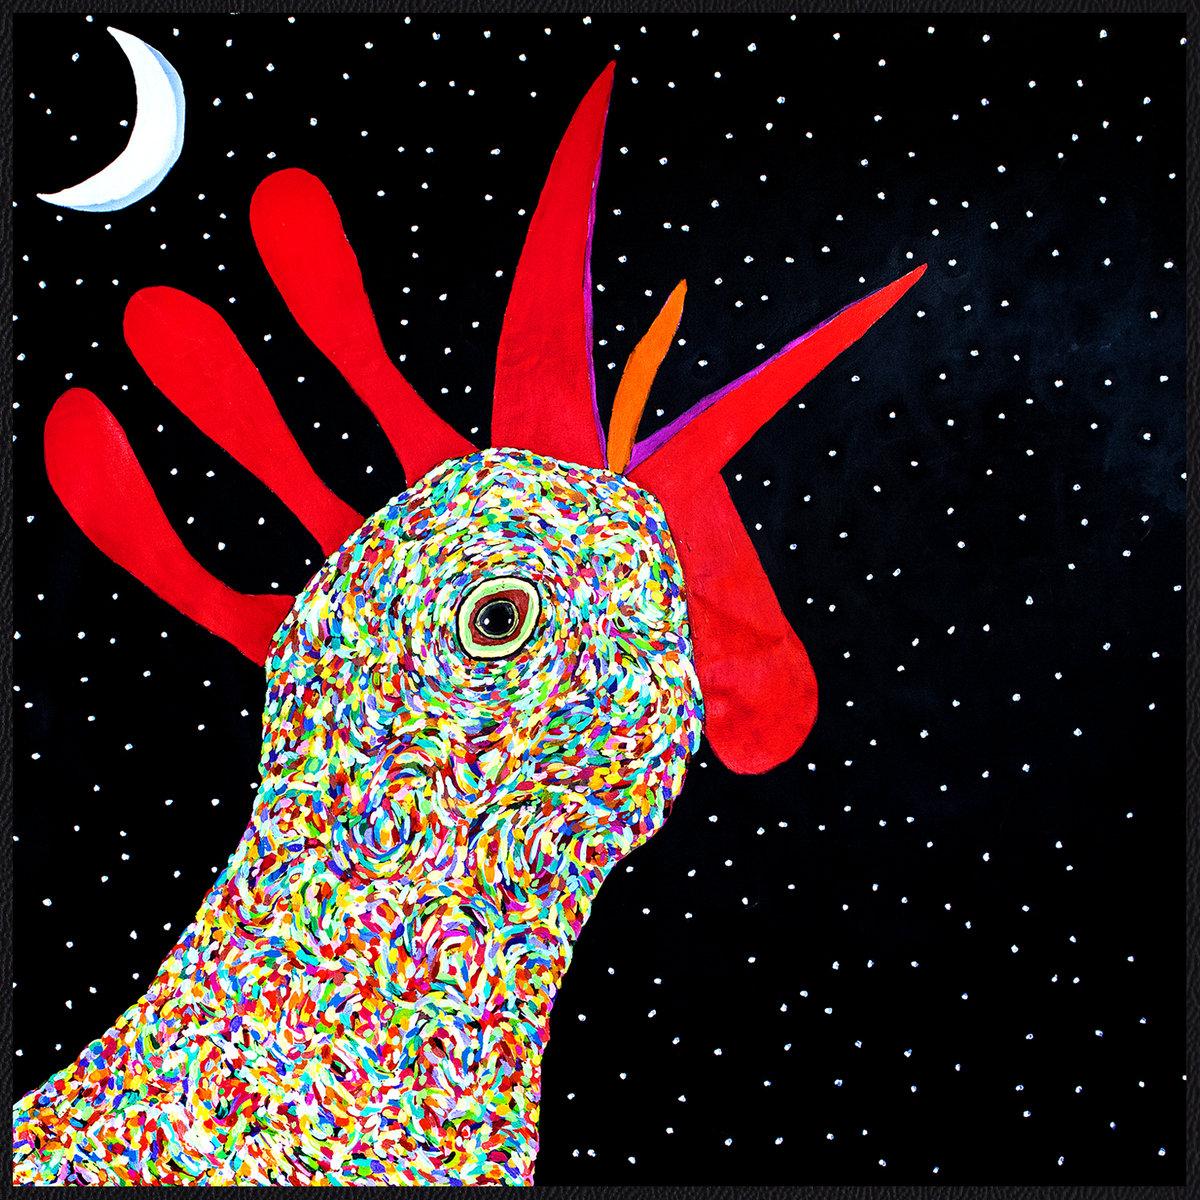 Daniel Norgren – Wooh Dang [LP]